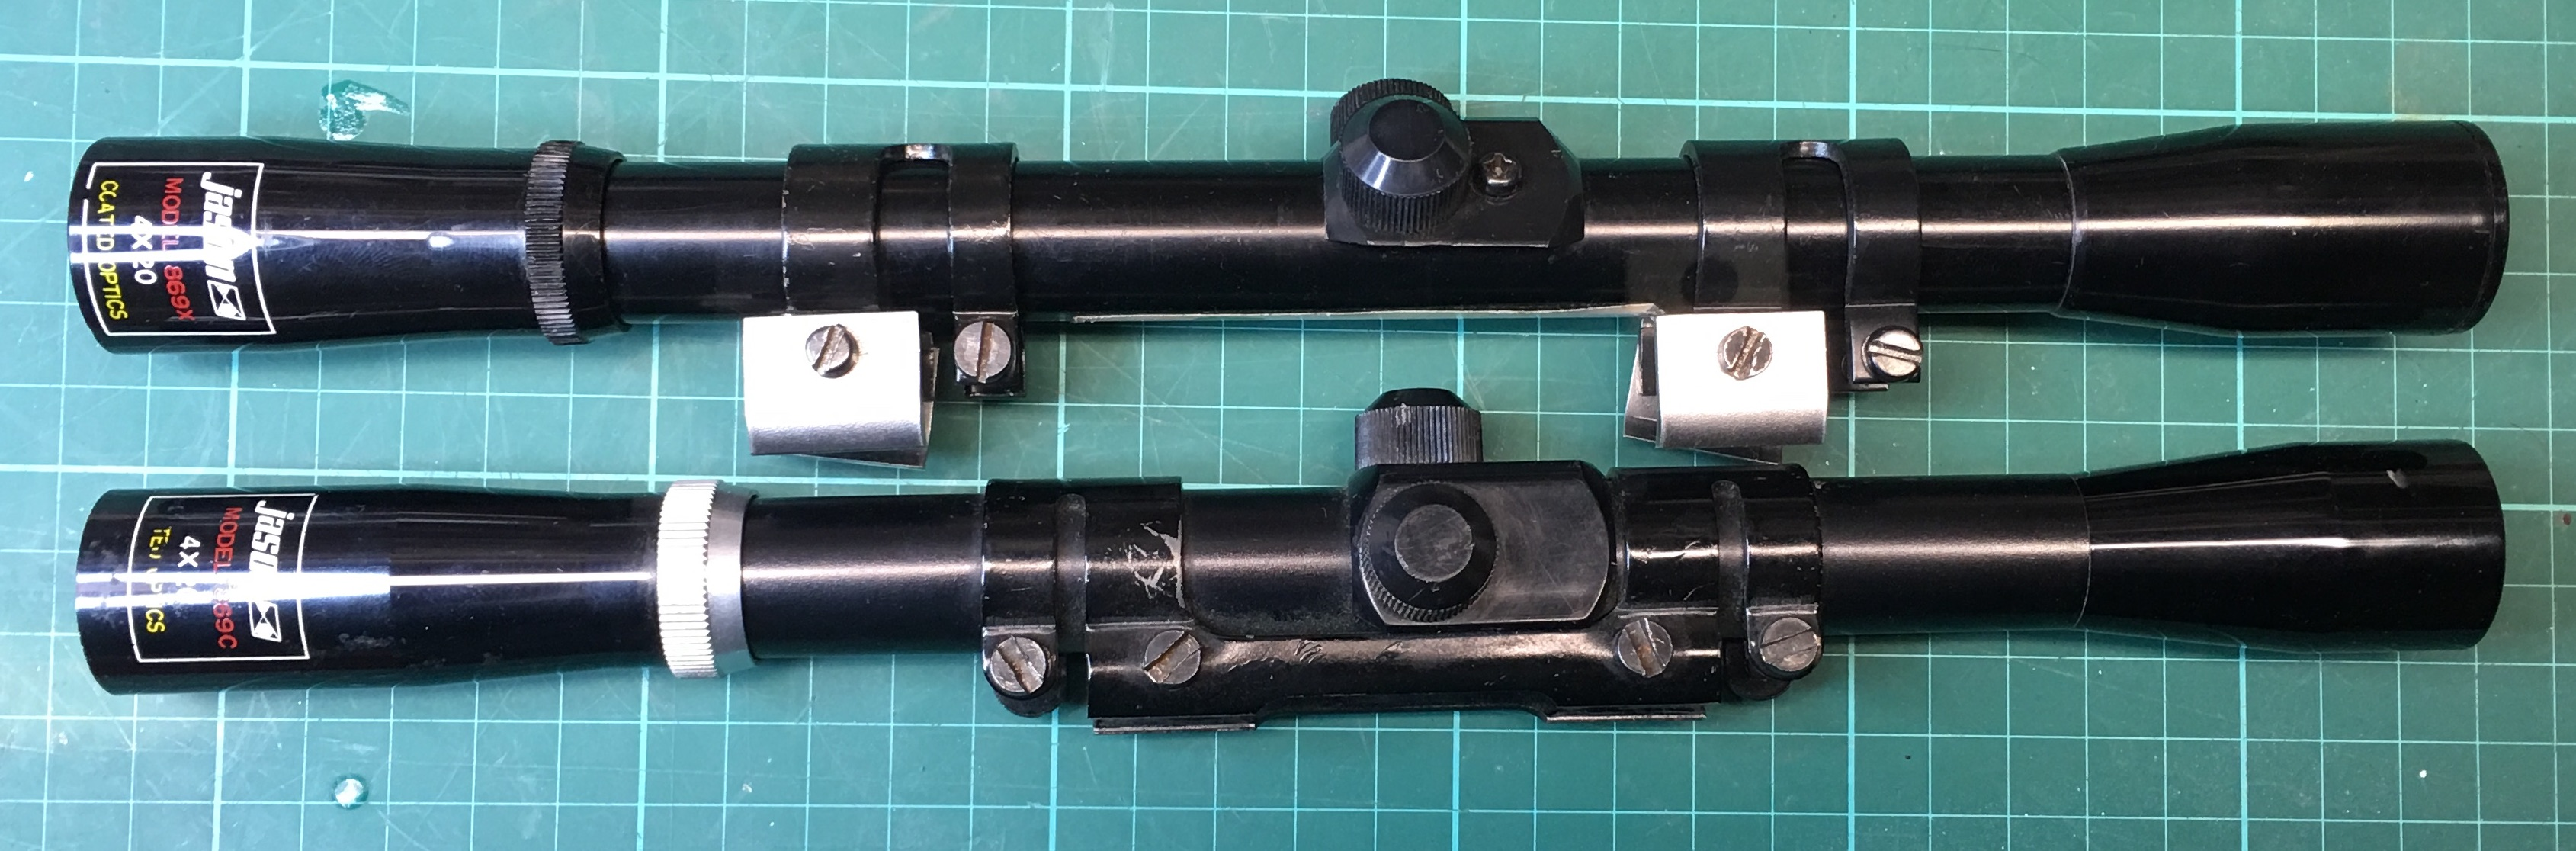 MPG 4x20 scopes 10.JPG